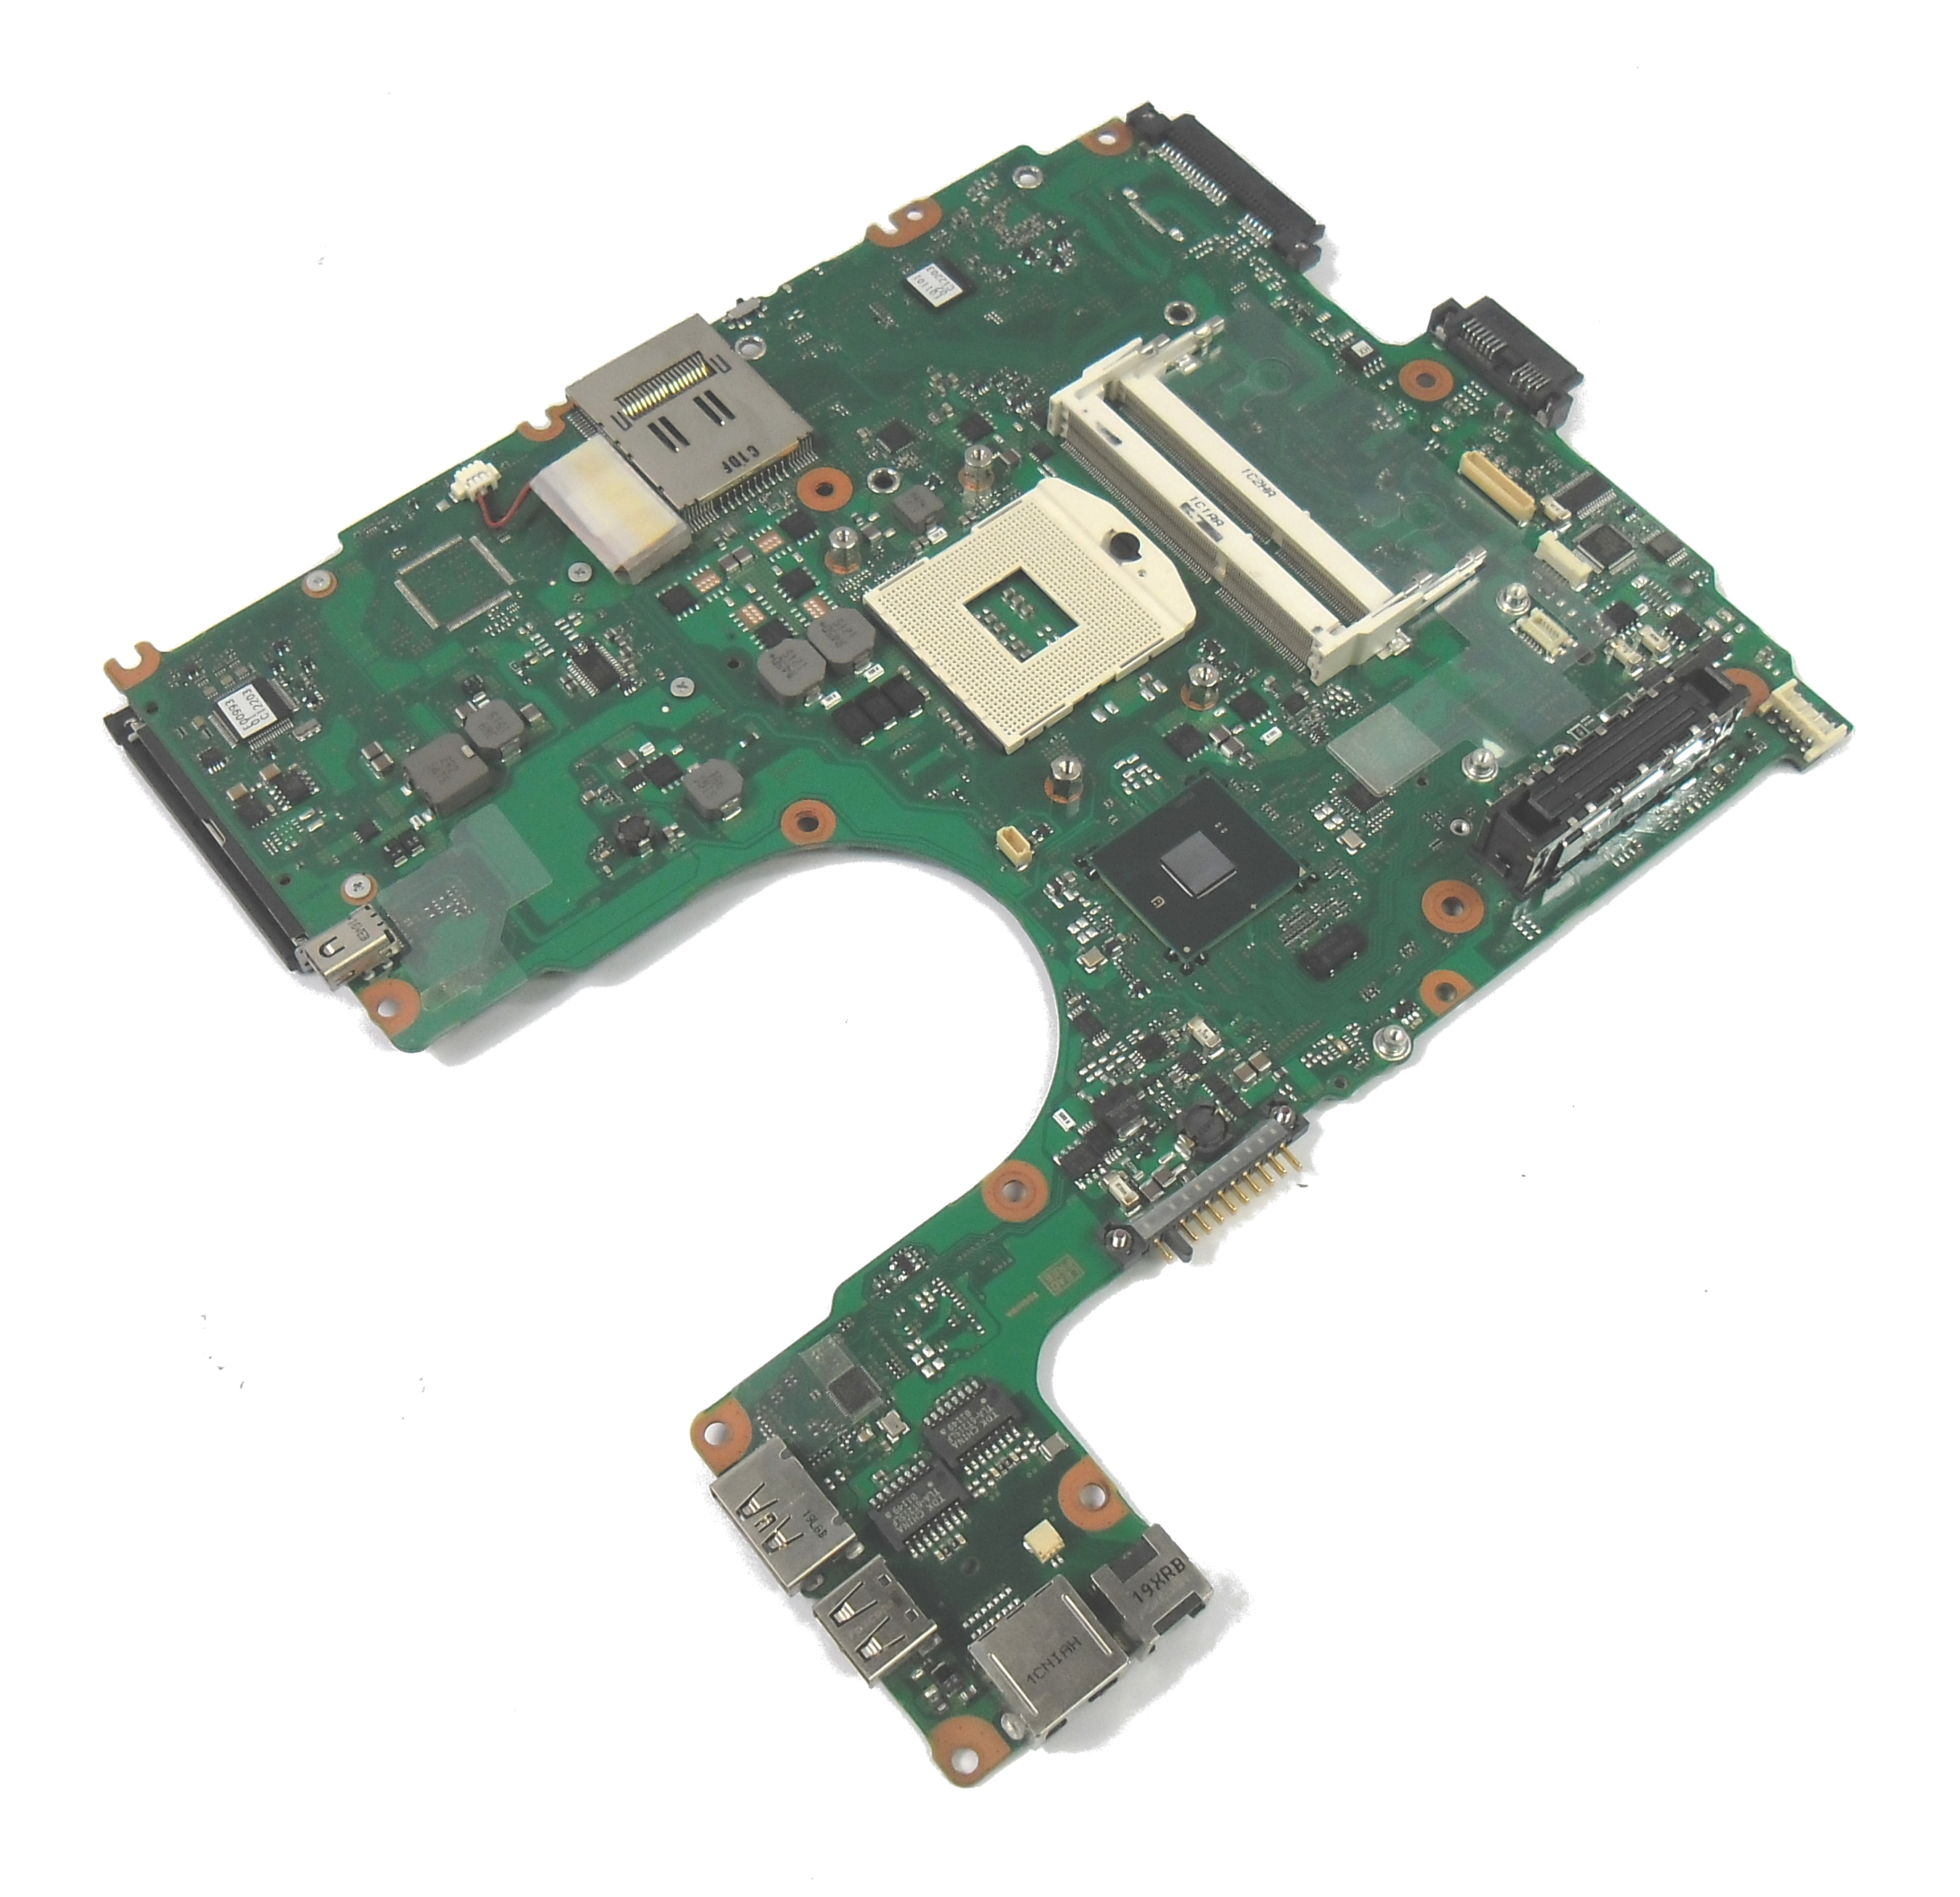 Toshiba A5A003064 Tecra A11-1FP Laptop Motherboard - FHNSY2